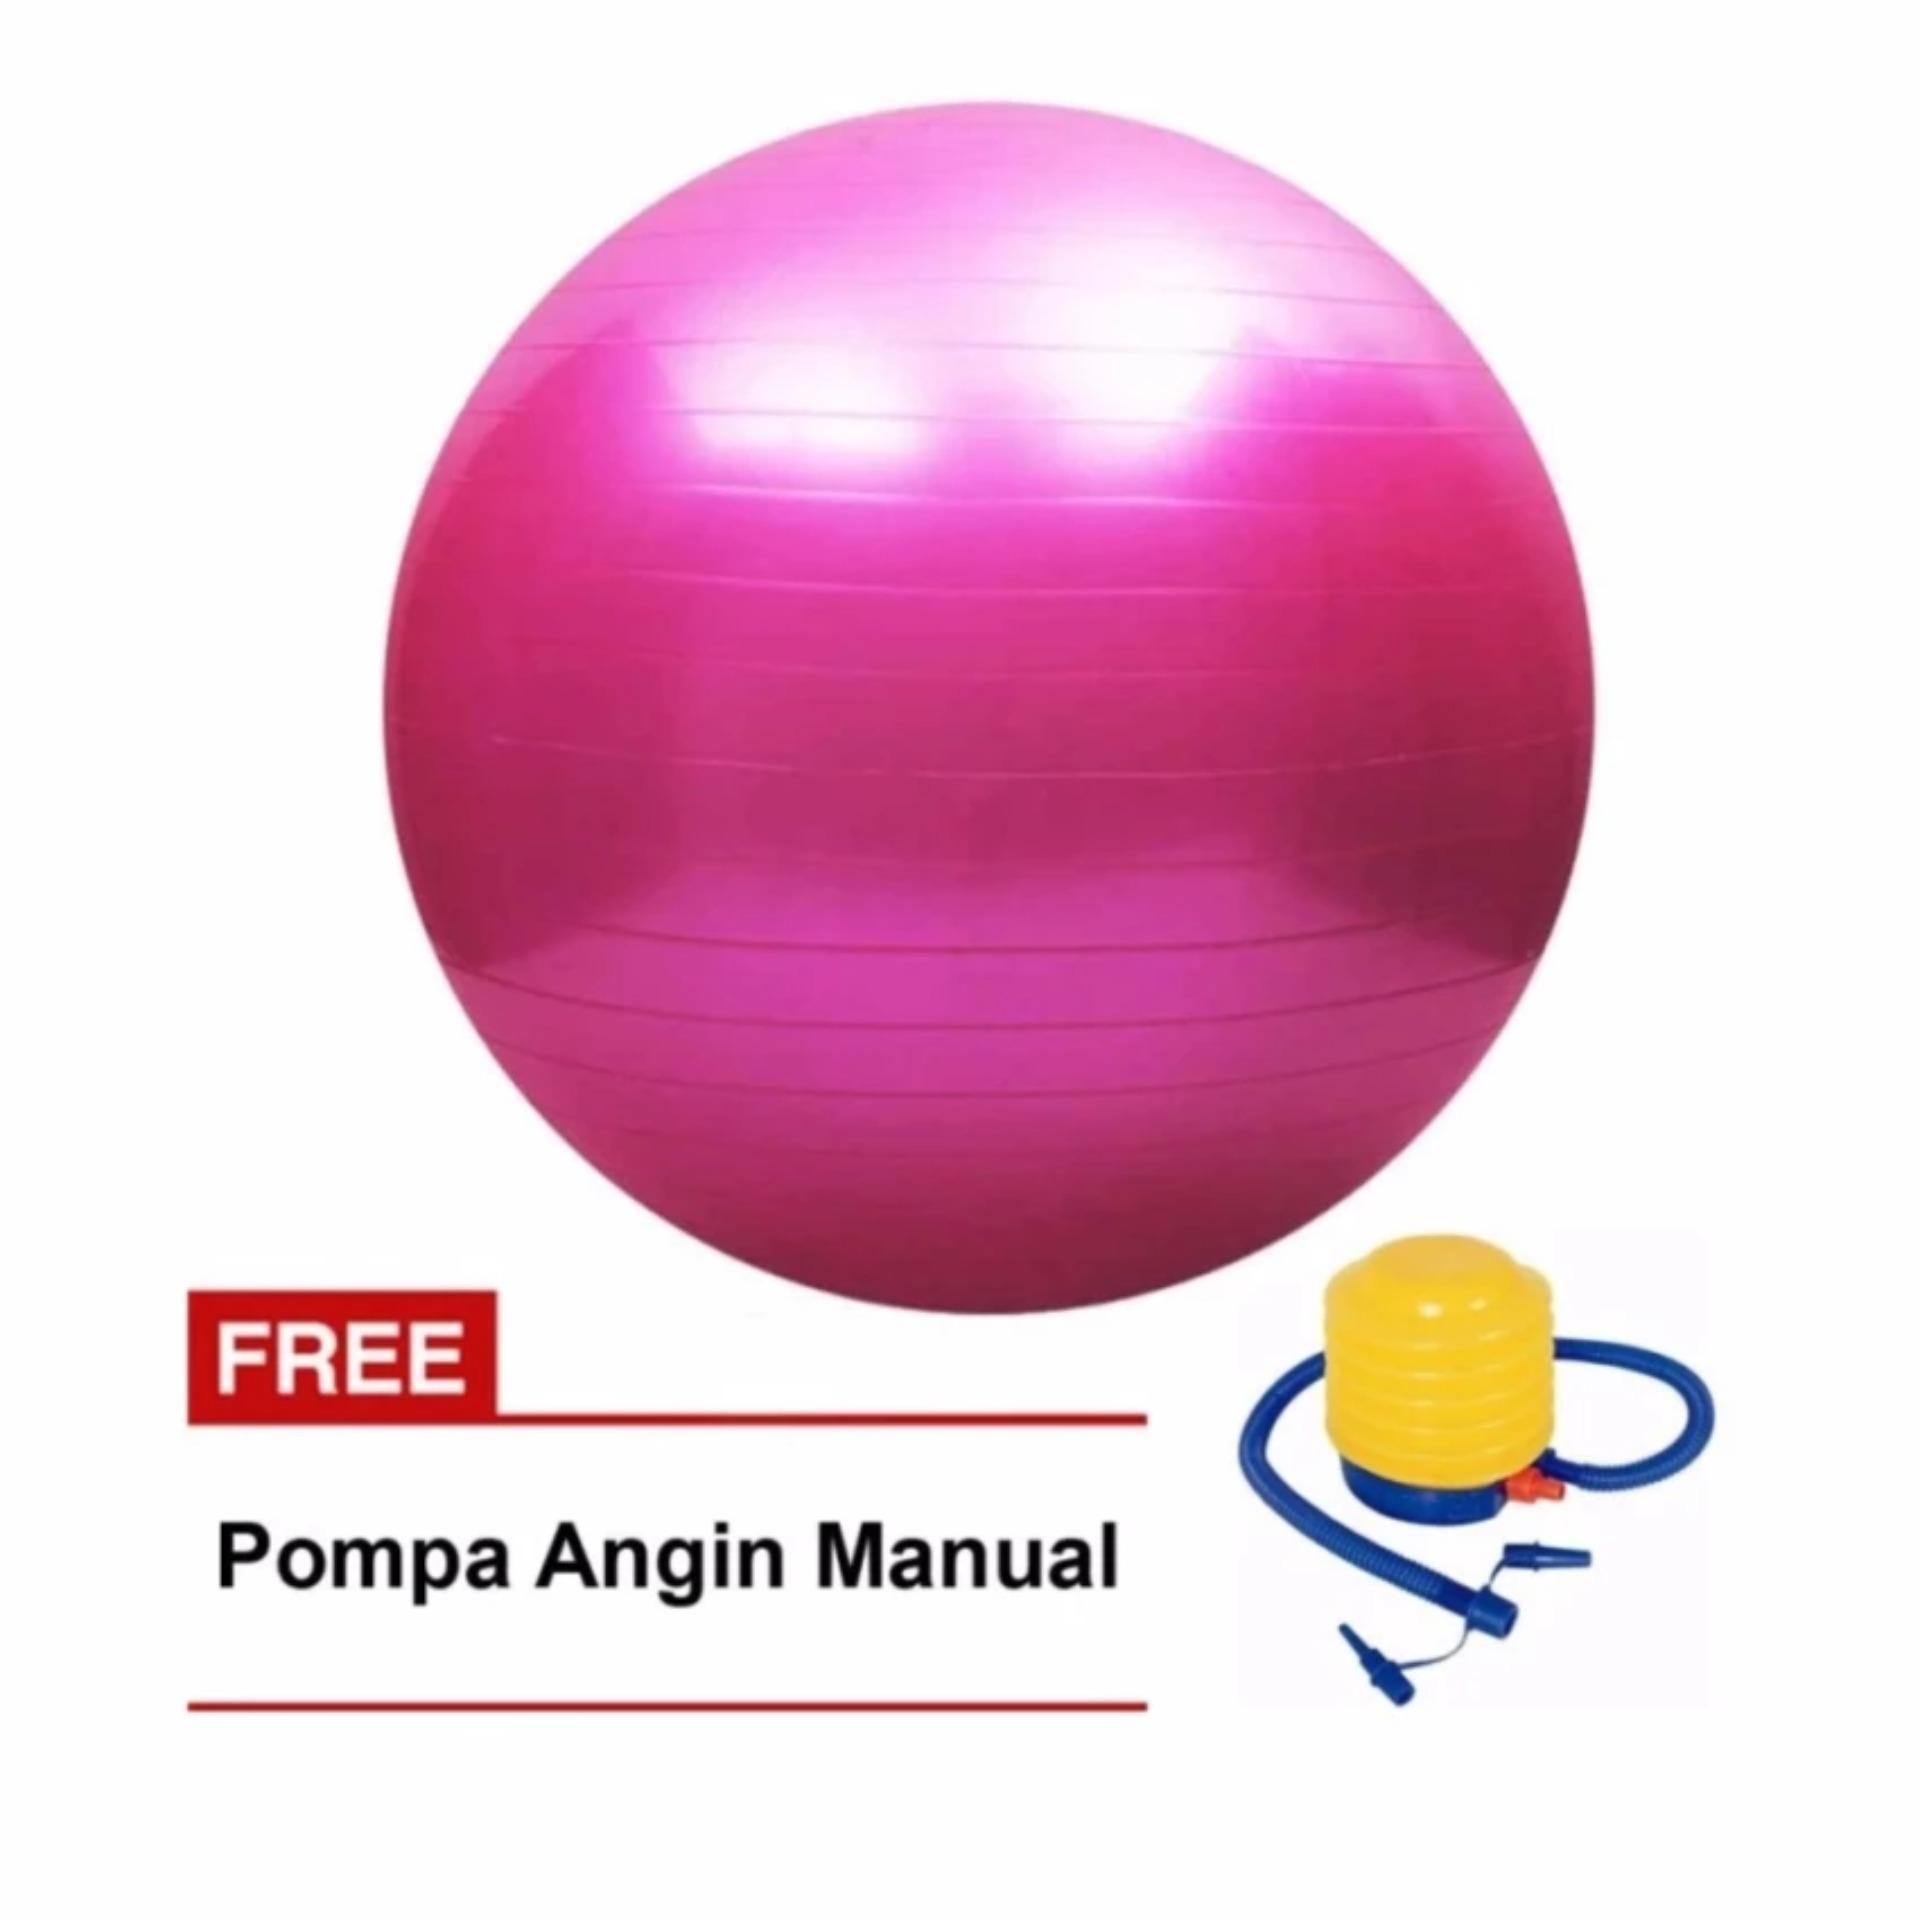 Kelebihan Bola Yoga Pilates Fitness Gym 65 Cm Biru Terkini Daftar Ball Olahraga Senam Kesehatan Exercise Uk 65cm Pompa Manual